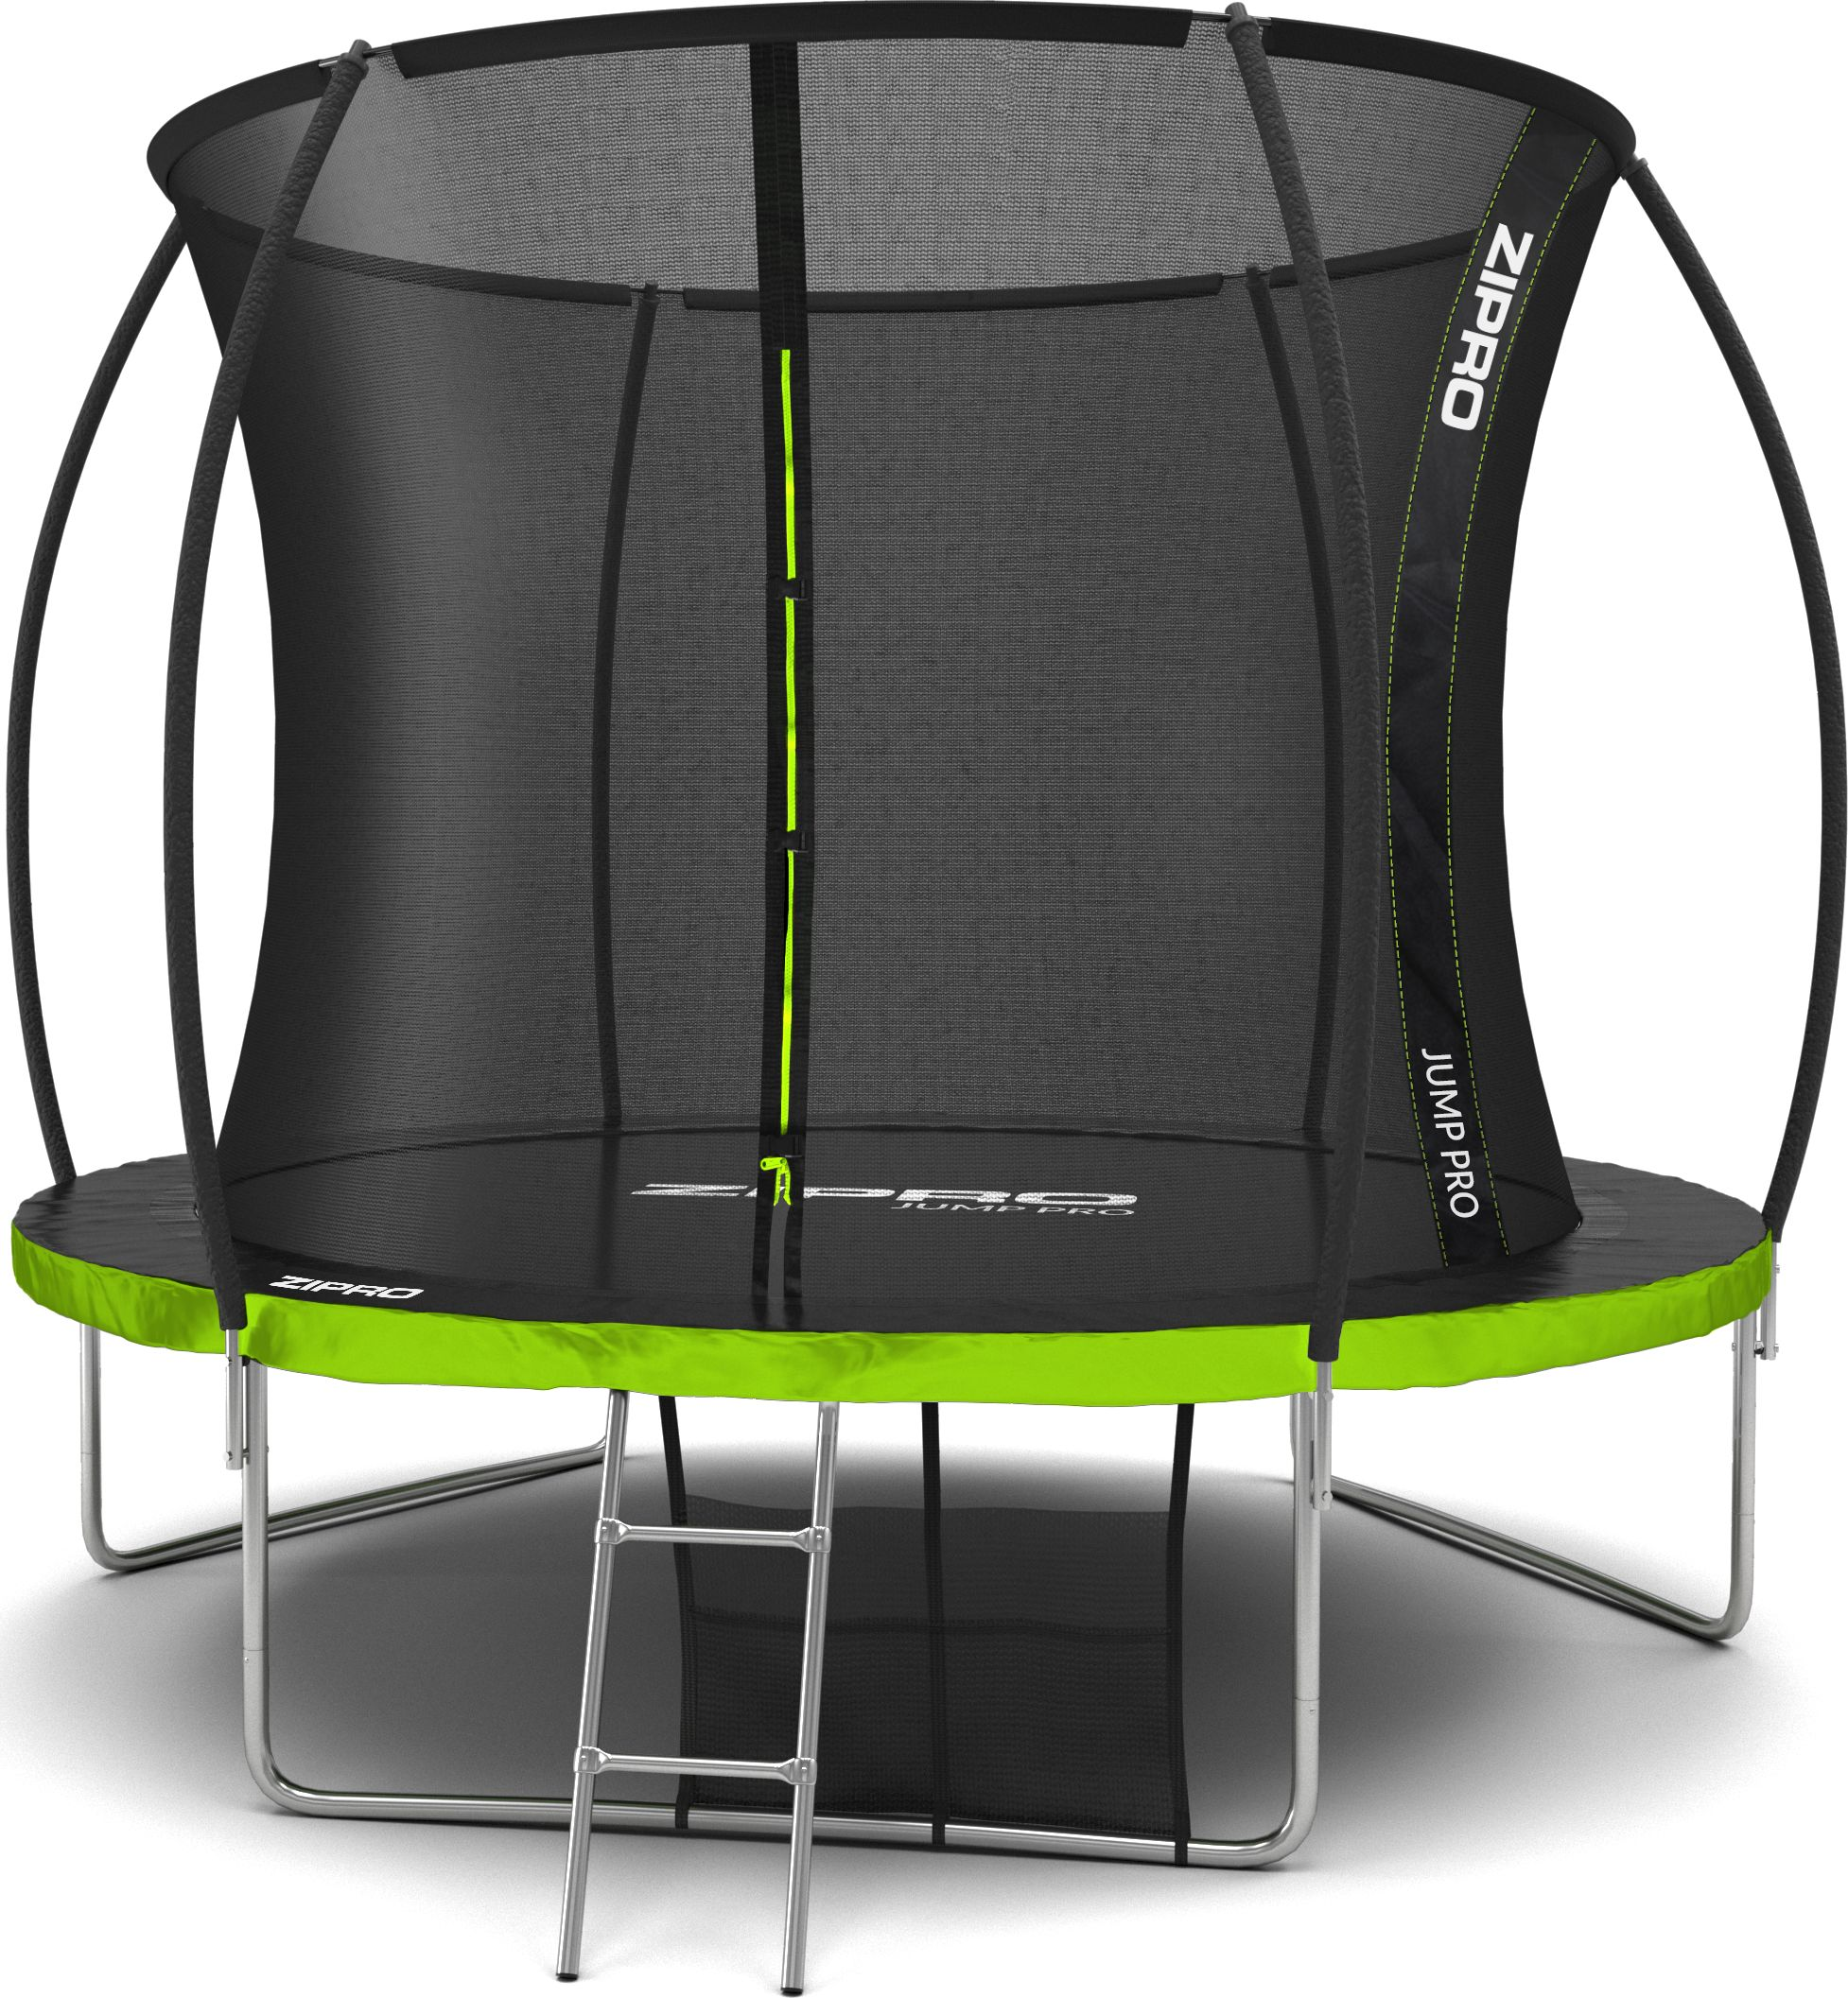 Zipro Garden trampoline Jump Pro 10FT 312cm with inner net + FREE shoe bag! Batuts